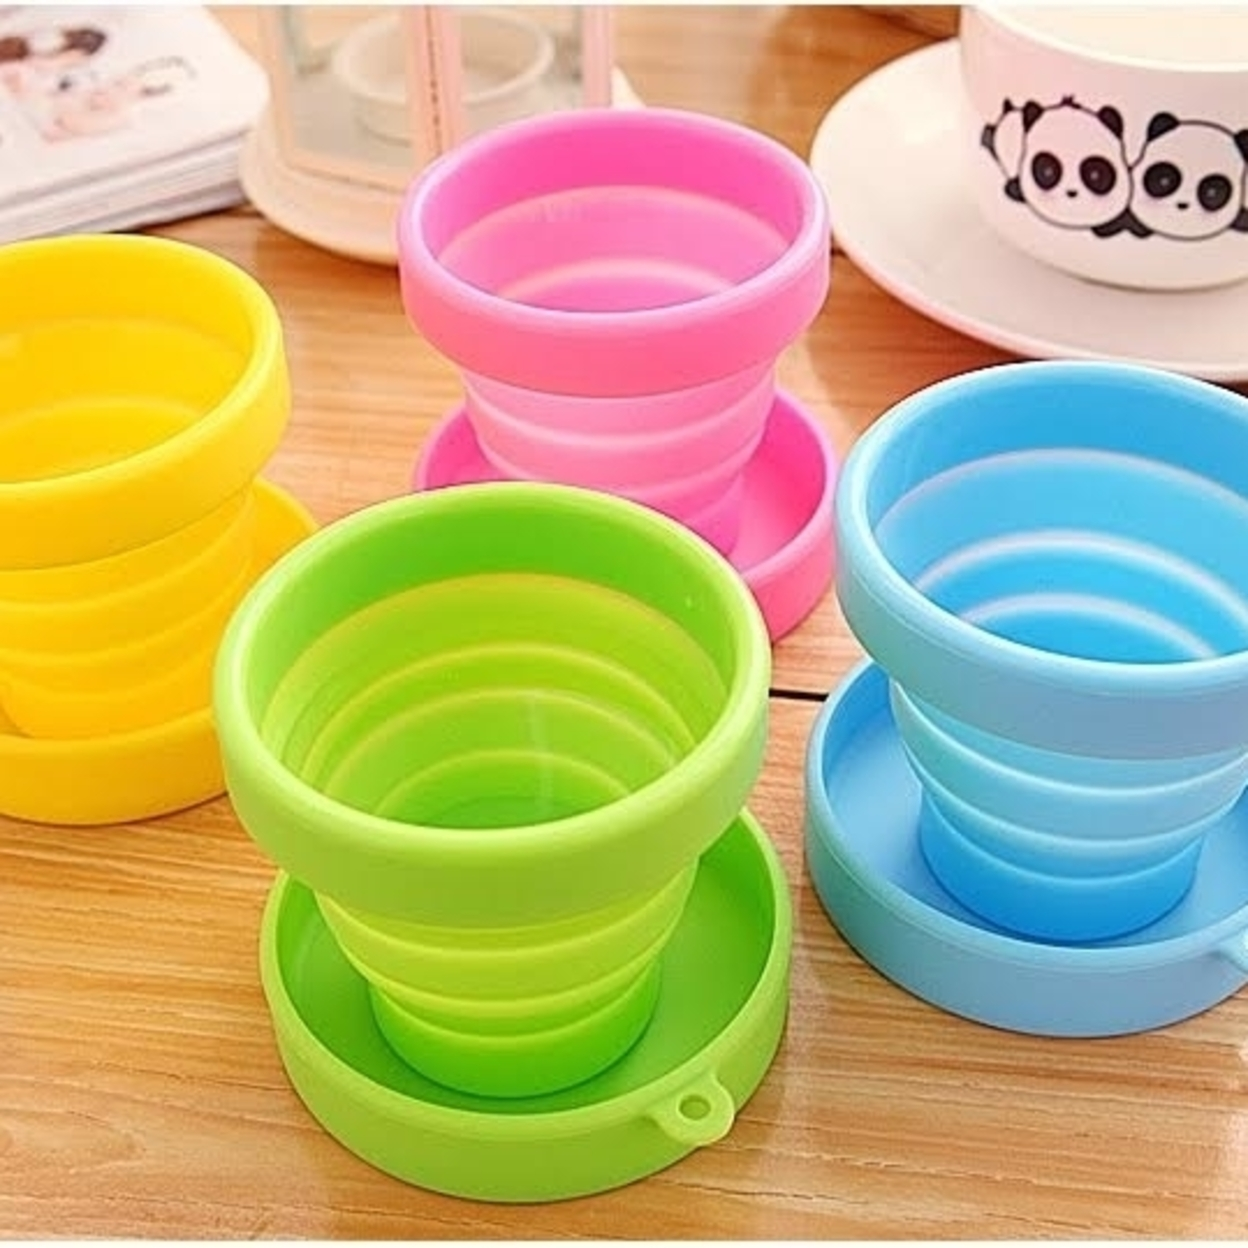 Folding Cup 2-Pack - Pink 56f588df683d6f40438b475e